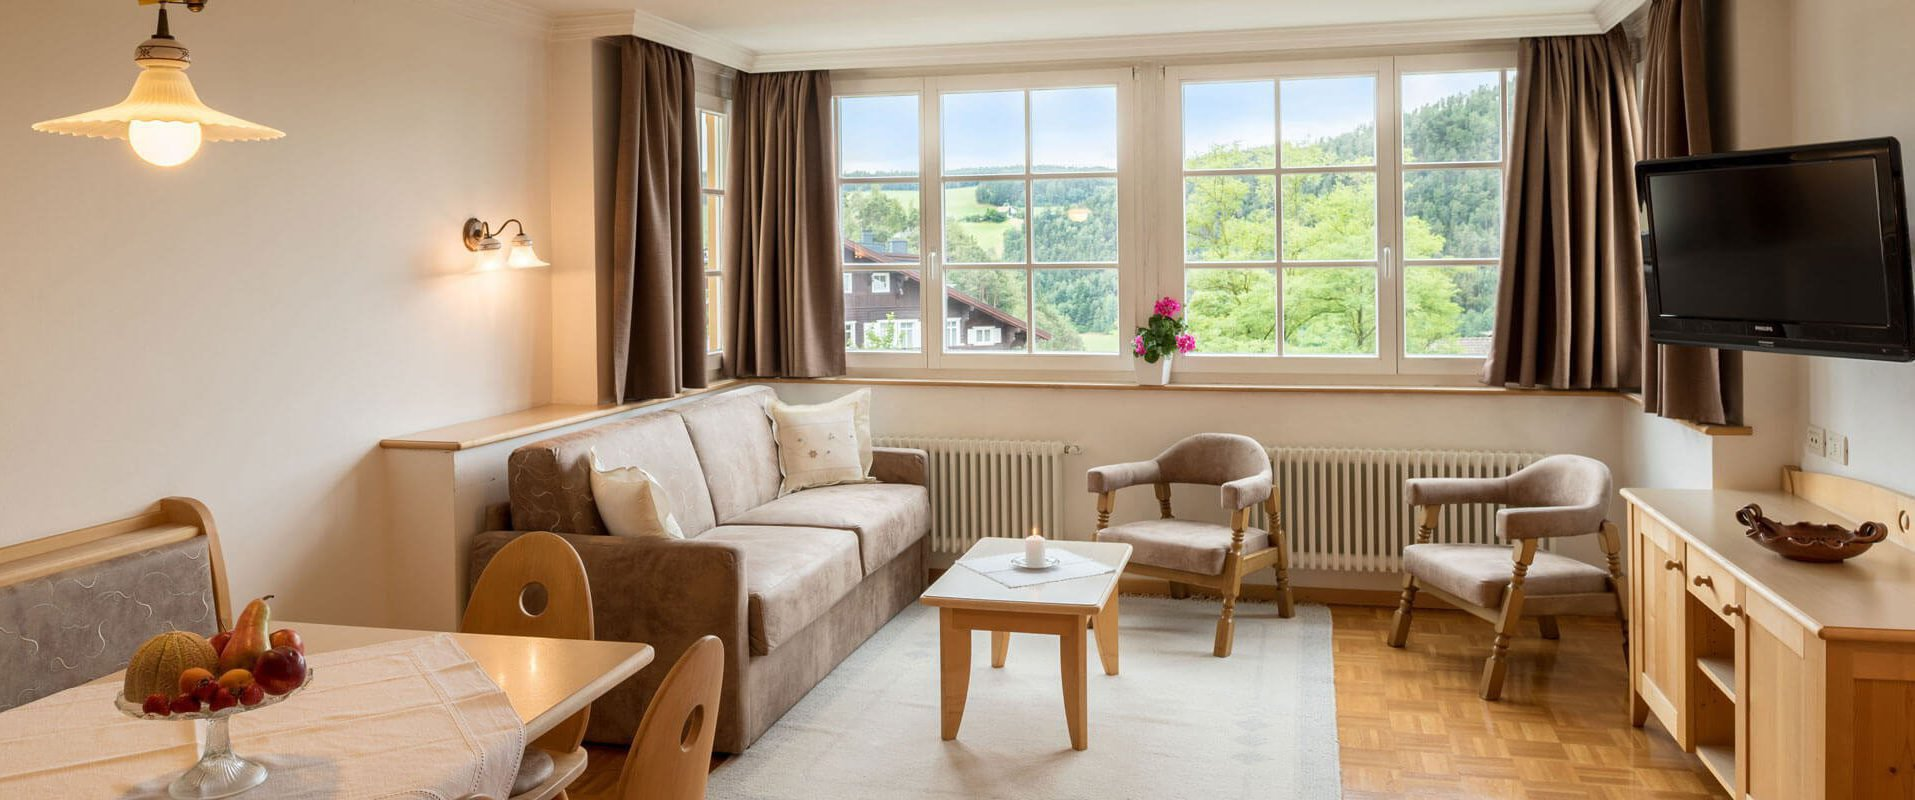 apartmenthaus-residence-seiser-akm